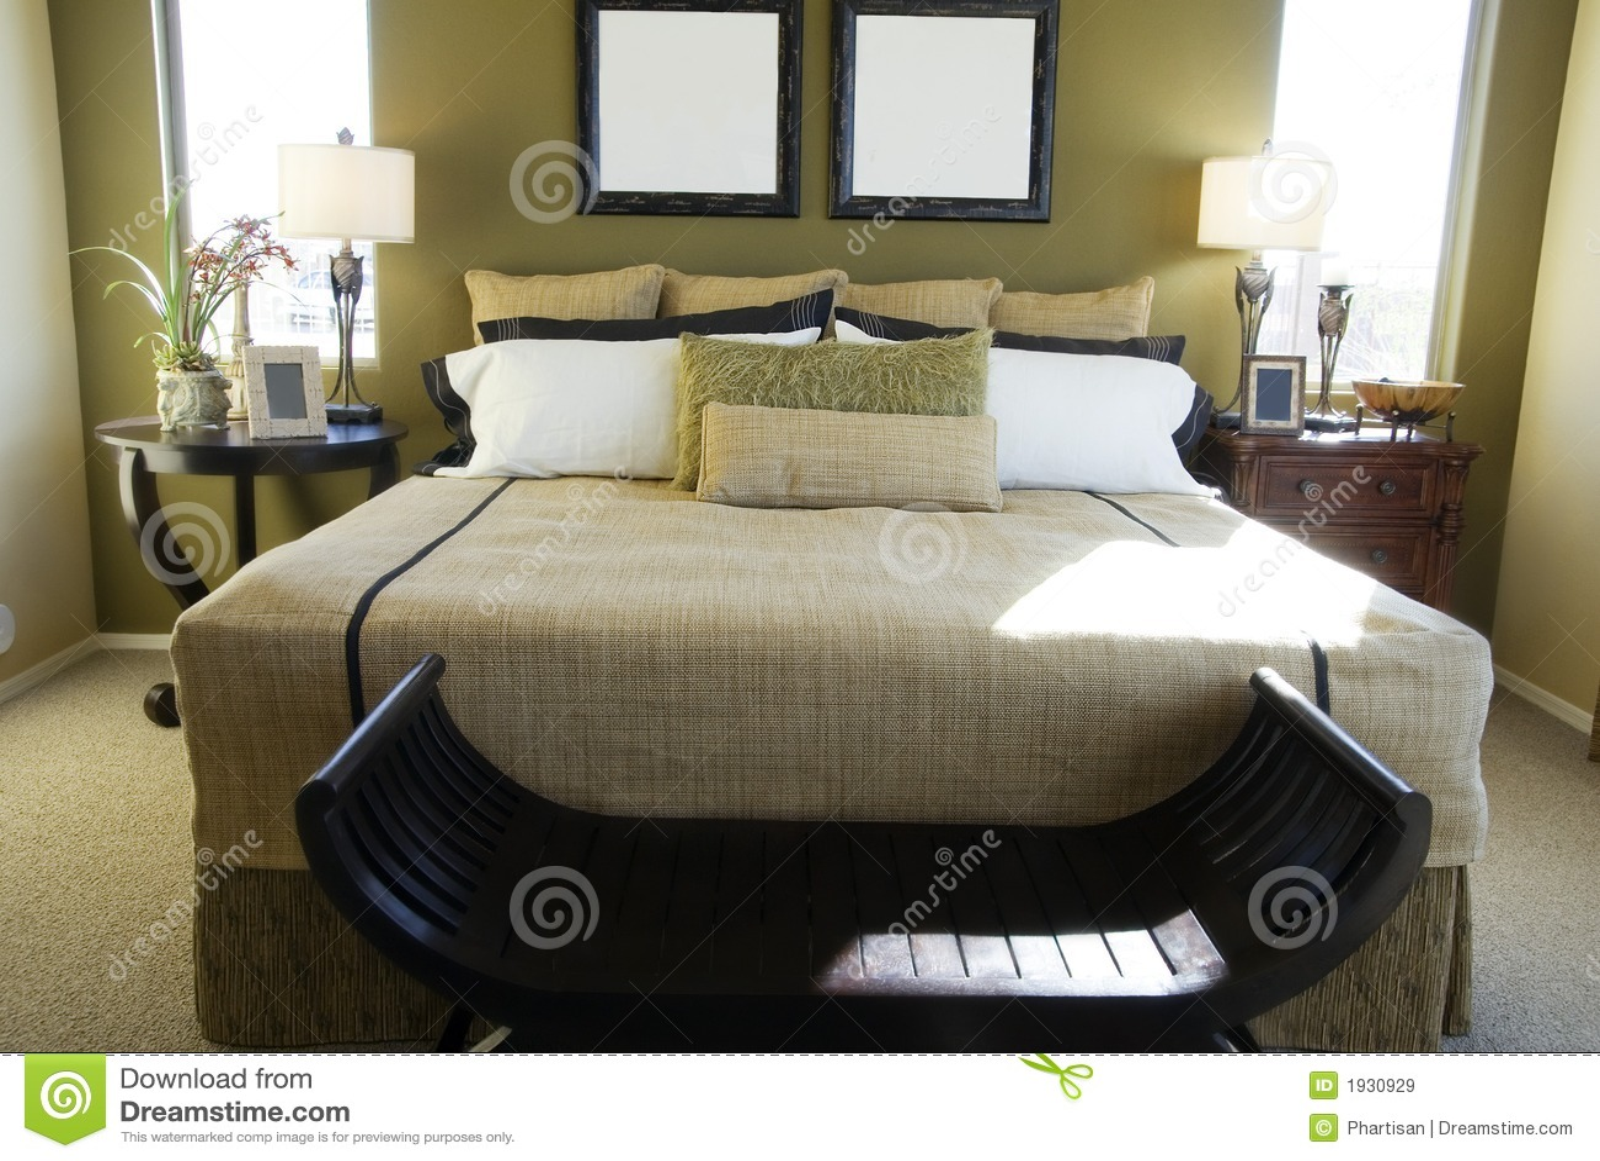 Chambre coucher de luxe moderne images libres de droits for Chambre de luxe moderne